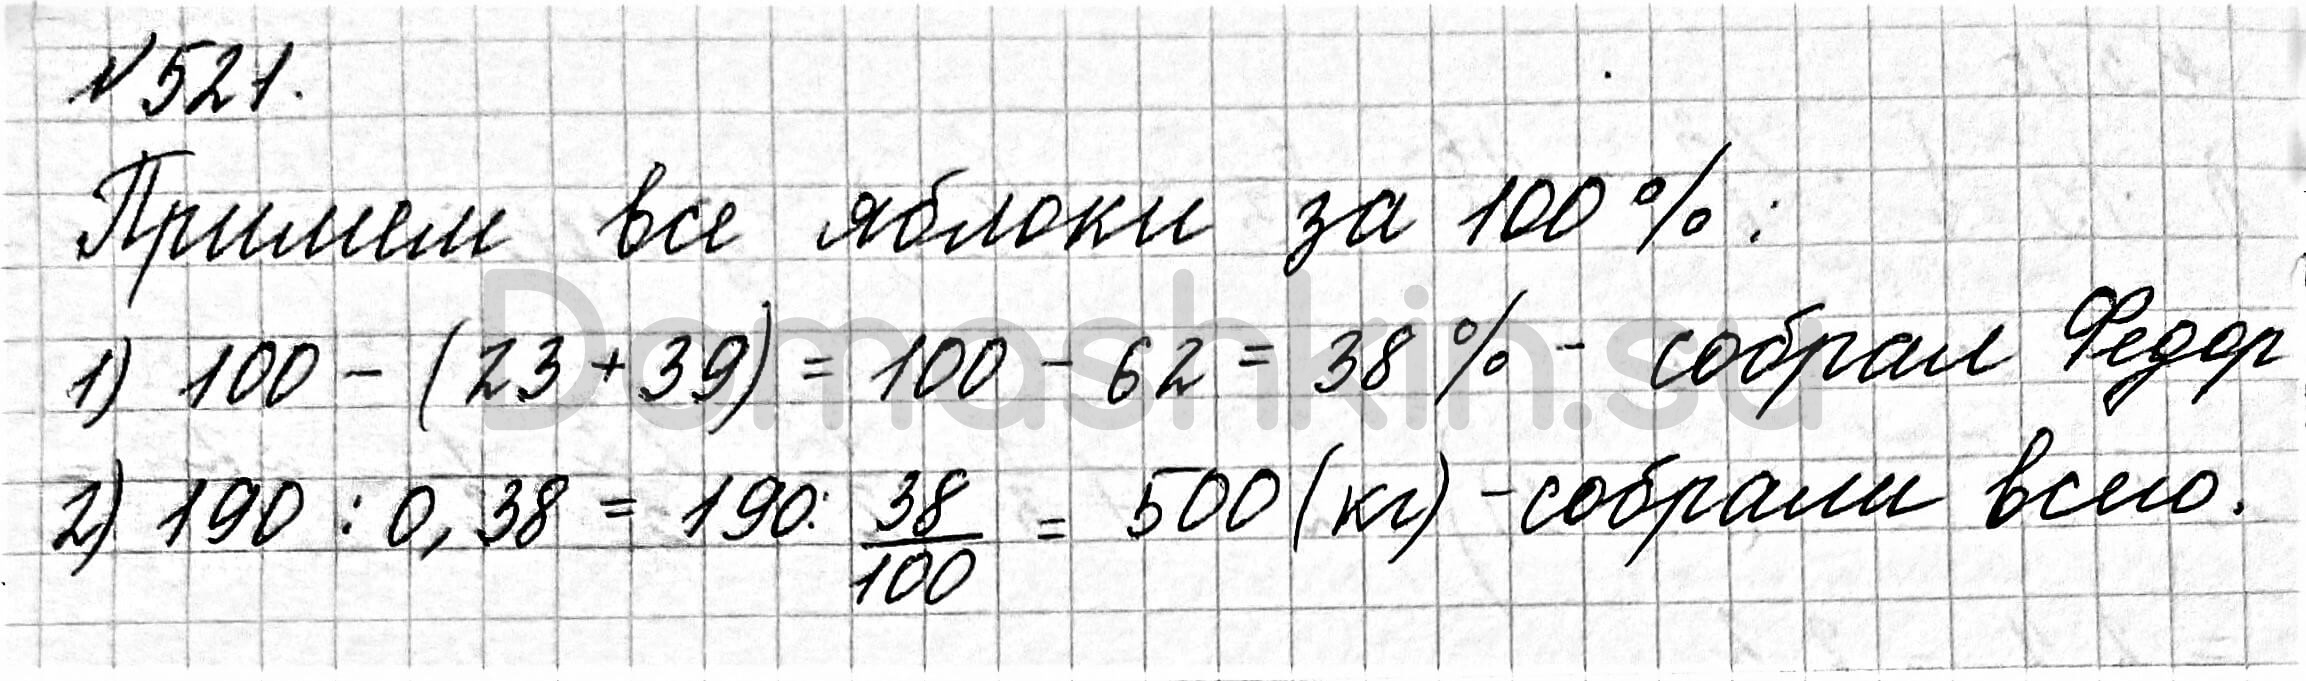 Математика 6 класс учебник Мерзляк номер 521 решение